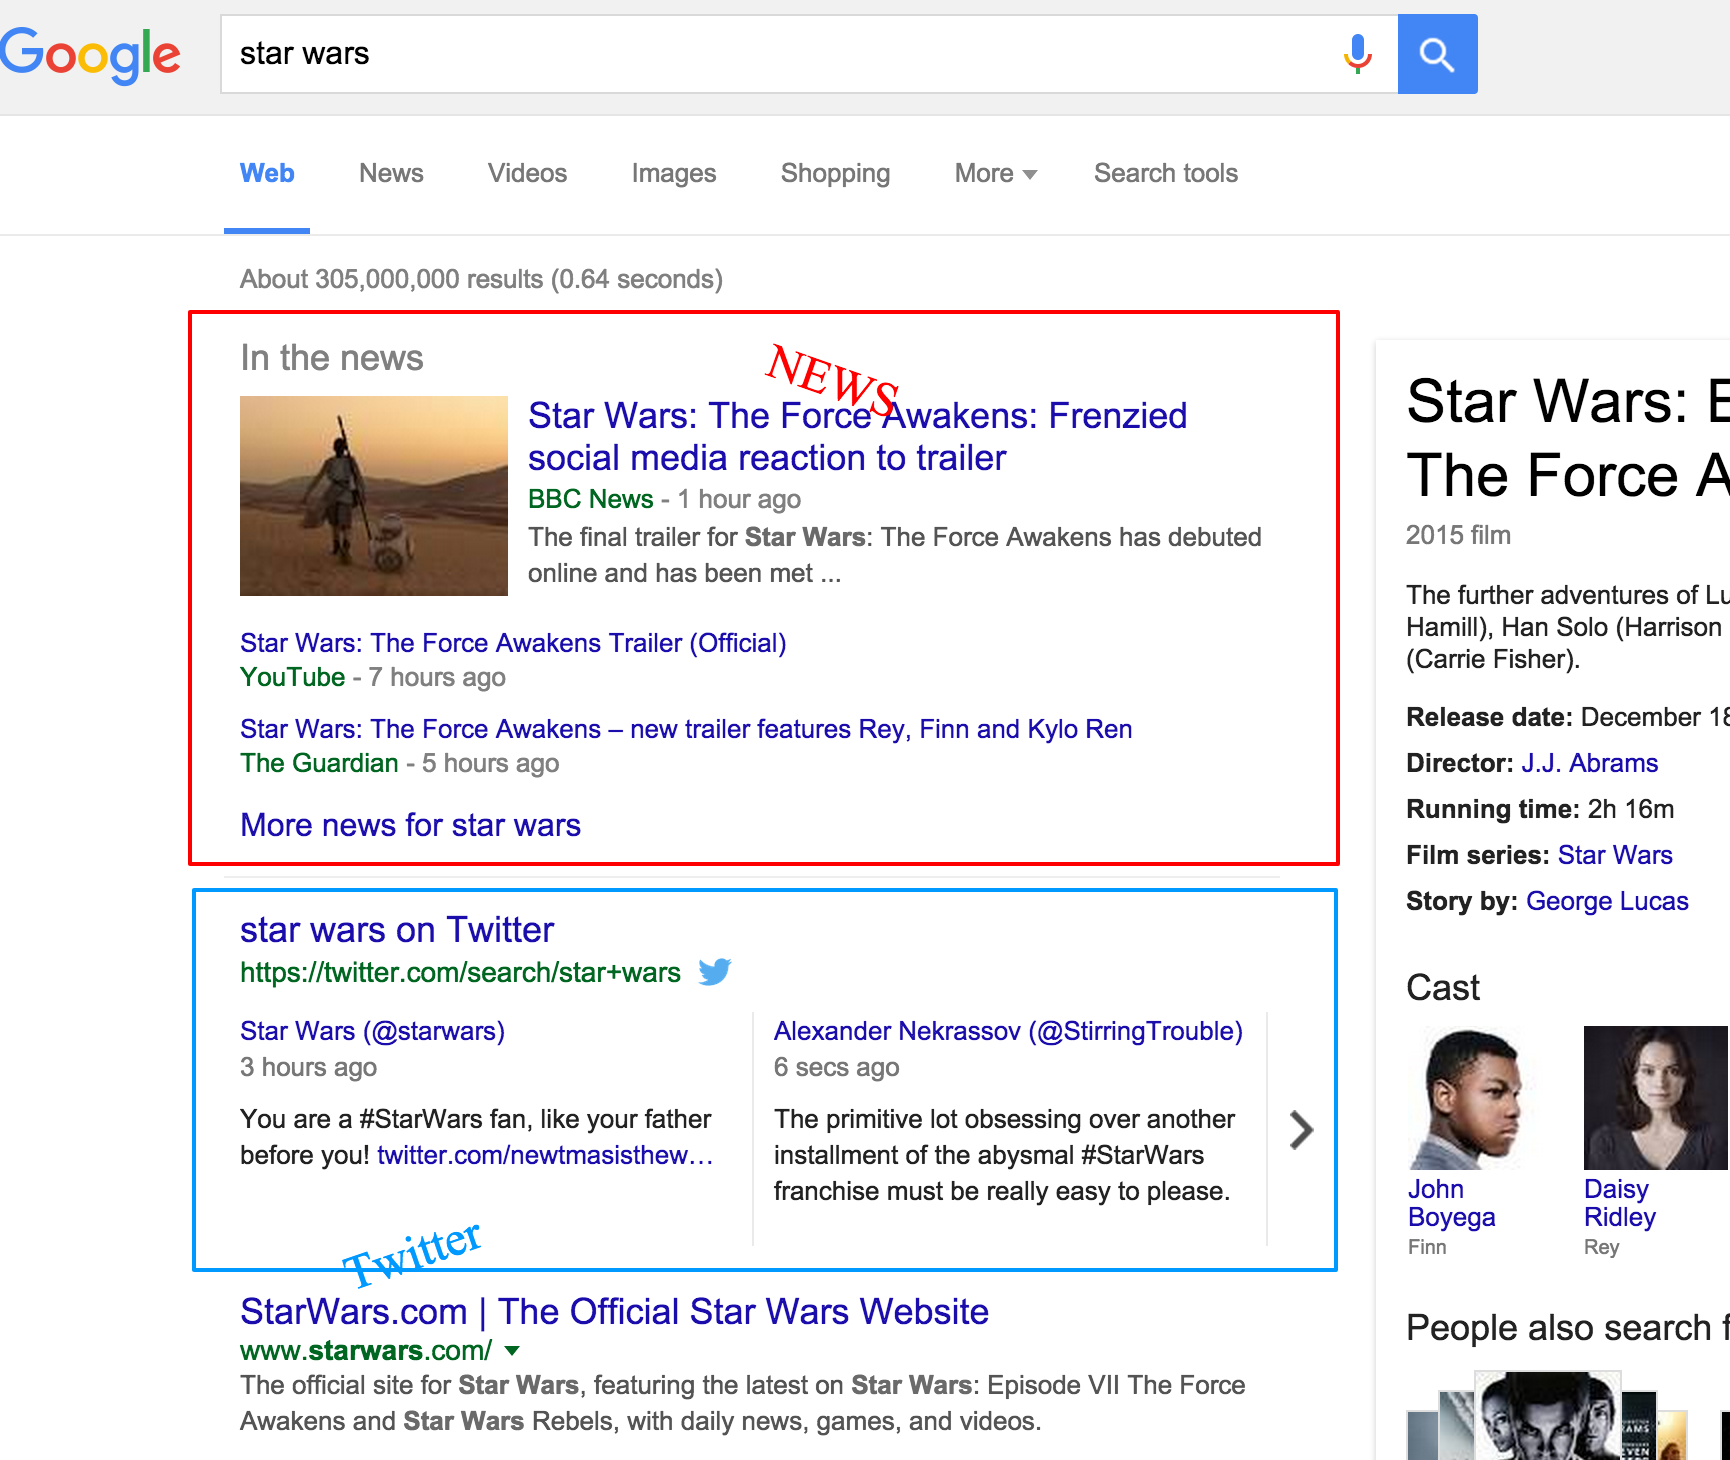 star wars google search